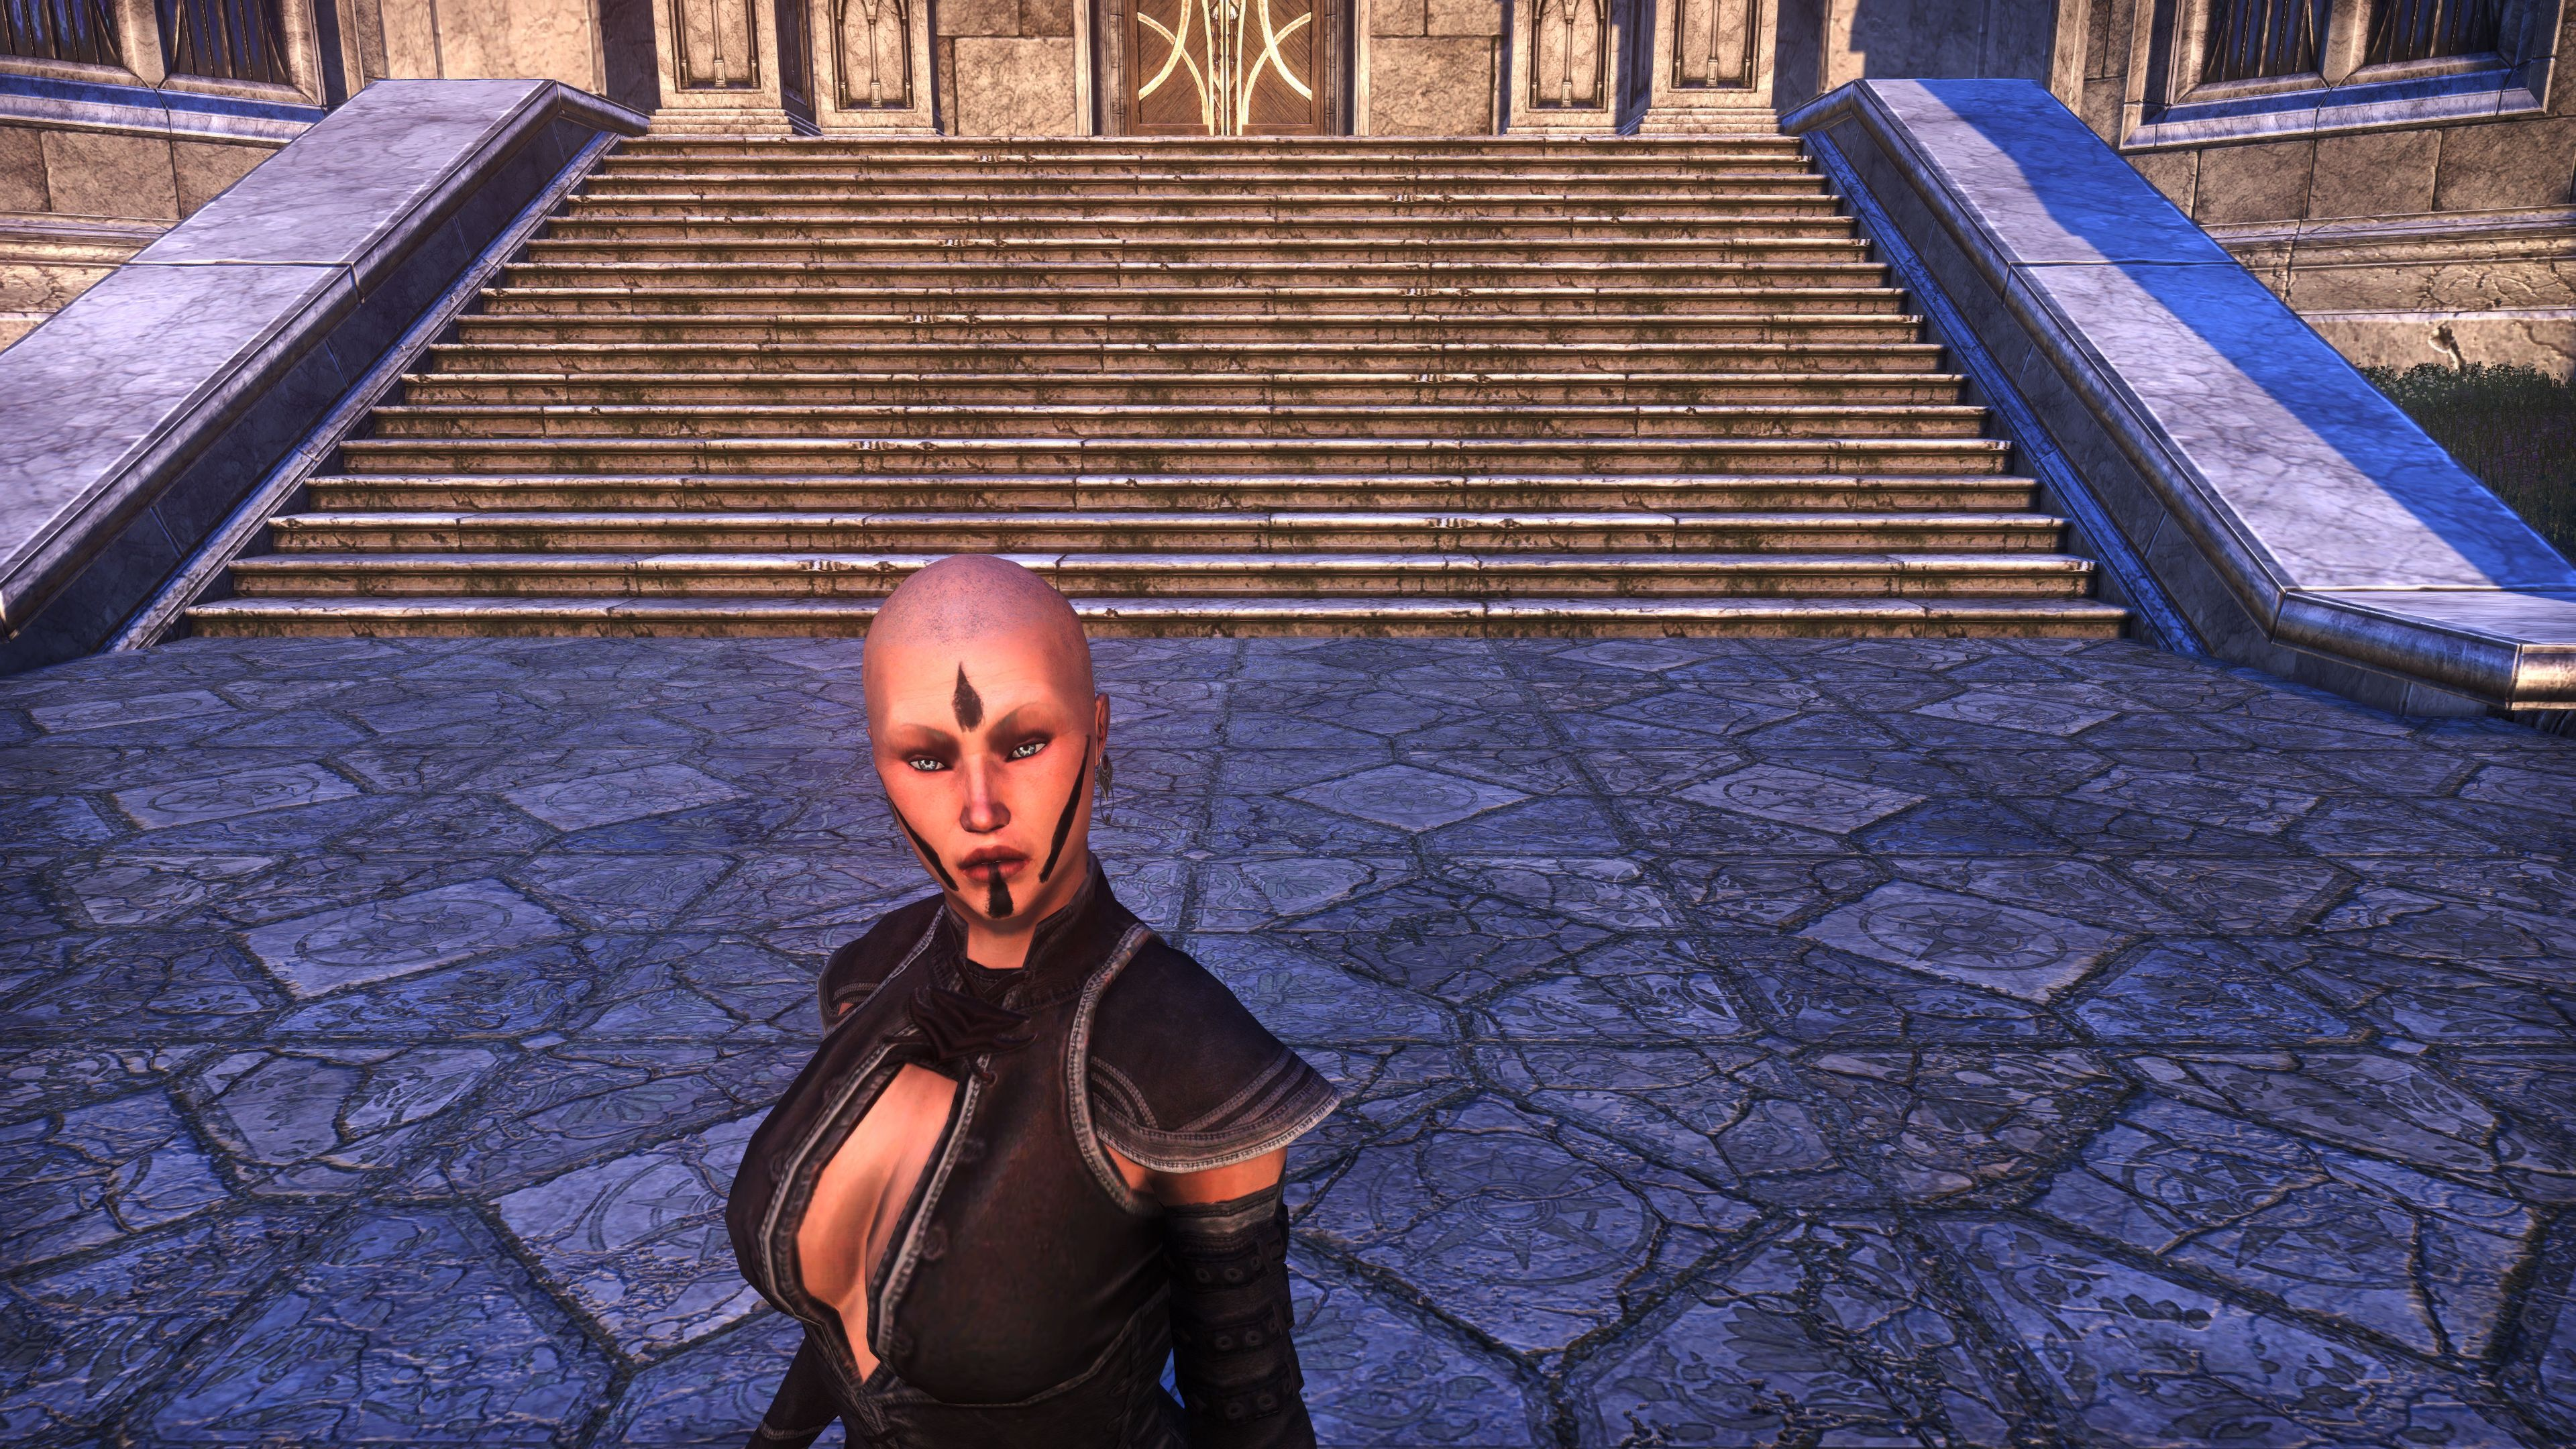 Meridian War Burst Face Markings (Appearance > Face Markings), Psijic Vault Crate, The Elder Scrolls Online